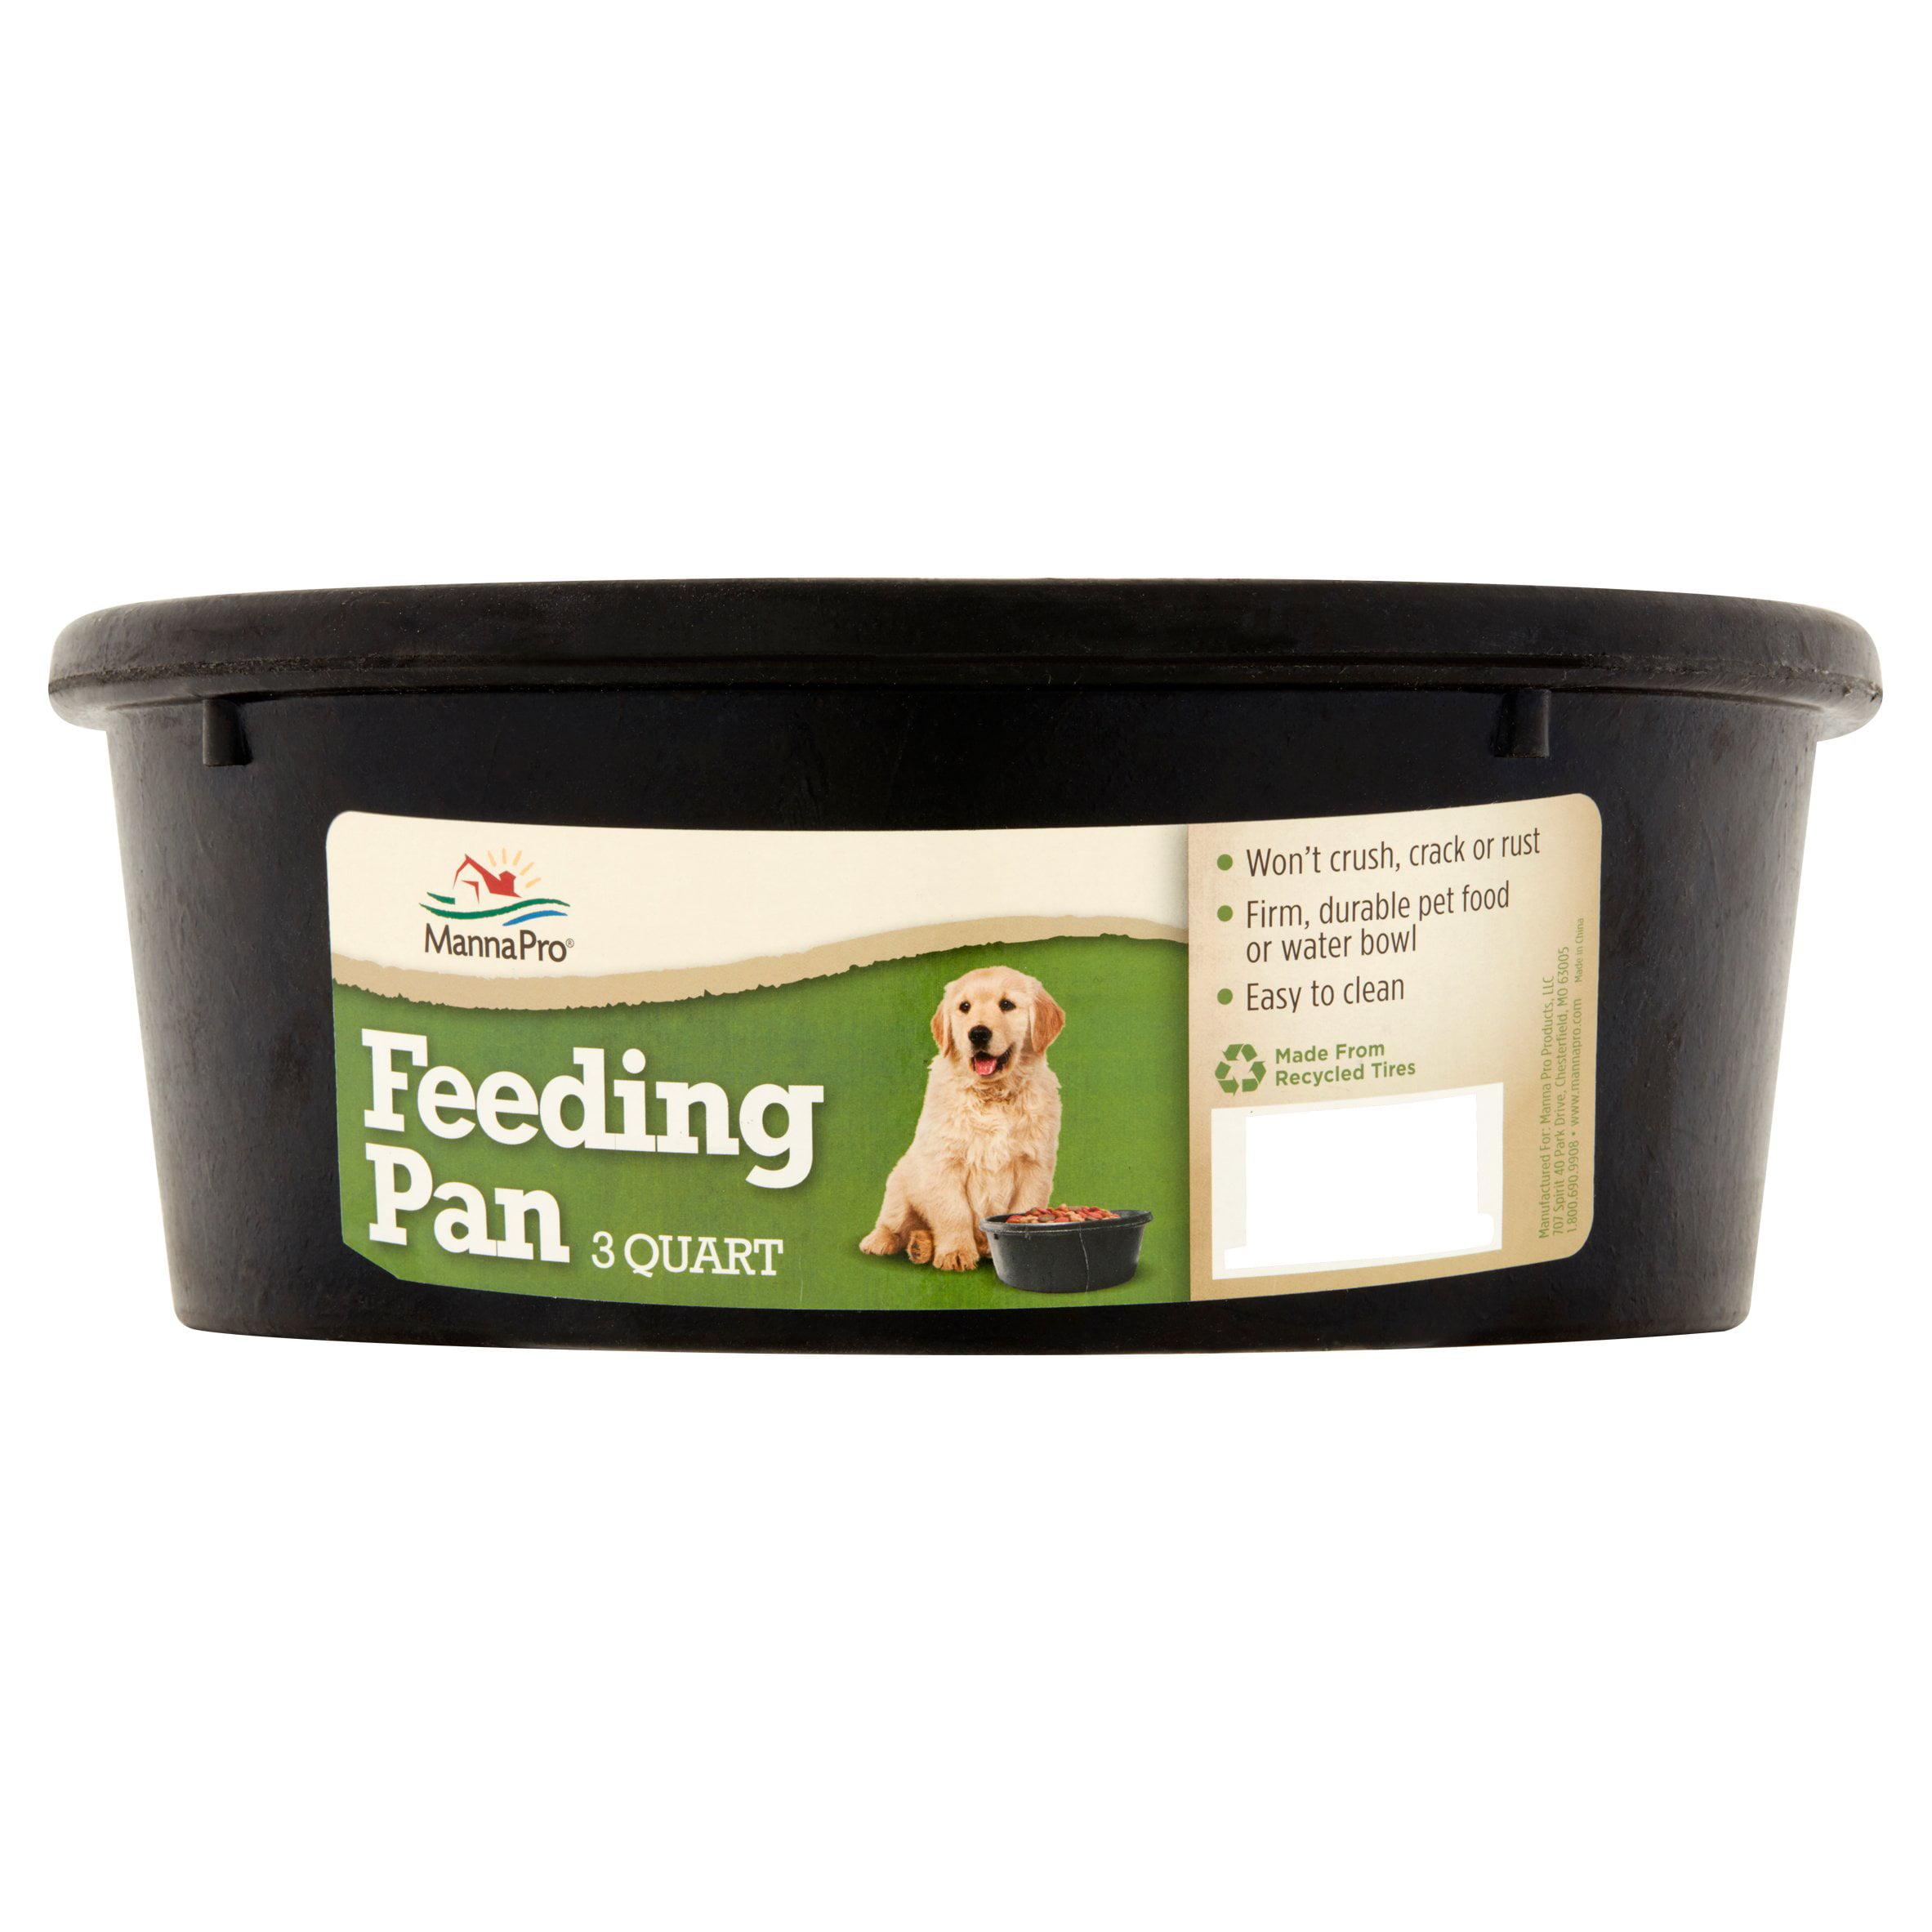 Manna Pro Feeding Pan Dog Bowl, 3 Qt